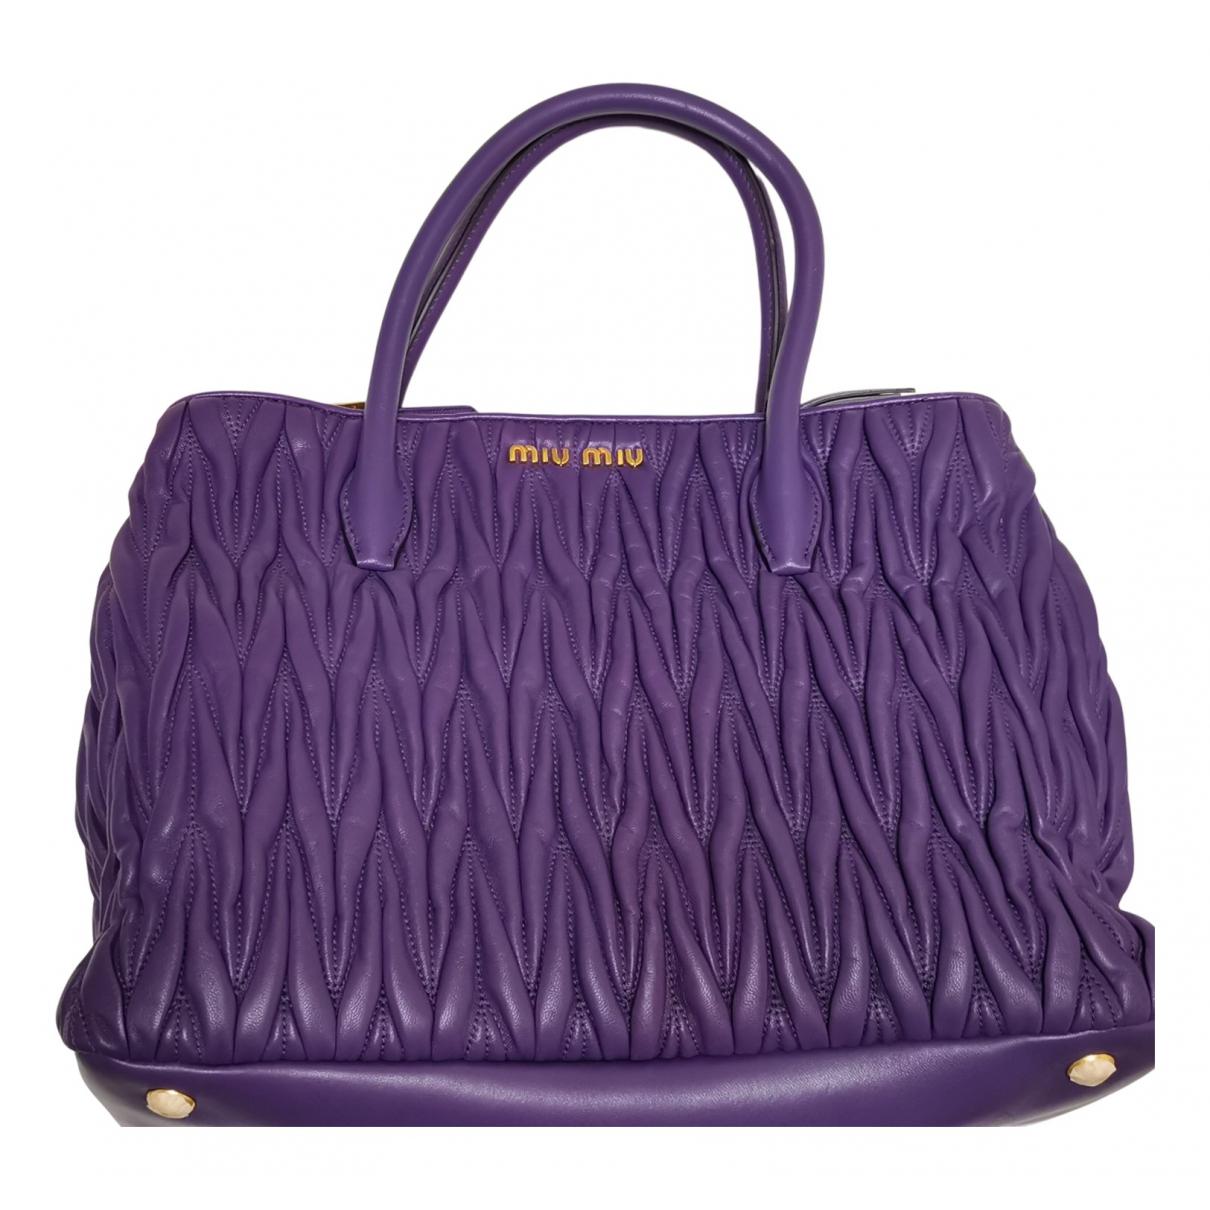 Miu Miu Matelassé Purple Leather handbag for Women N